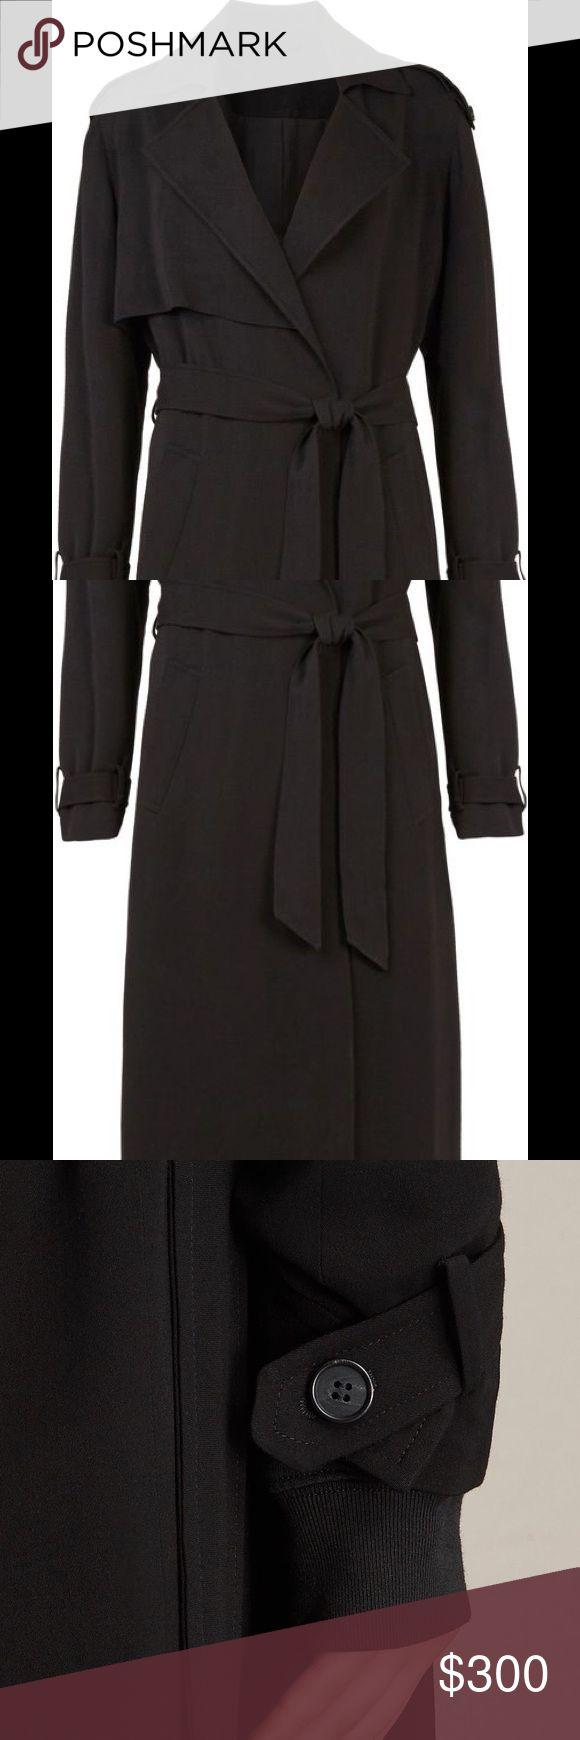 Allsaints Amelie Drape Coat Brand New with Tags Allsaints Jackets & Coats